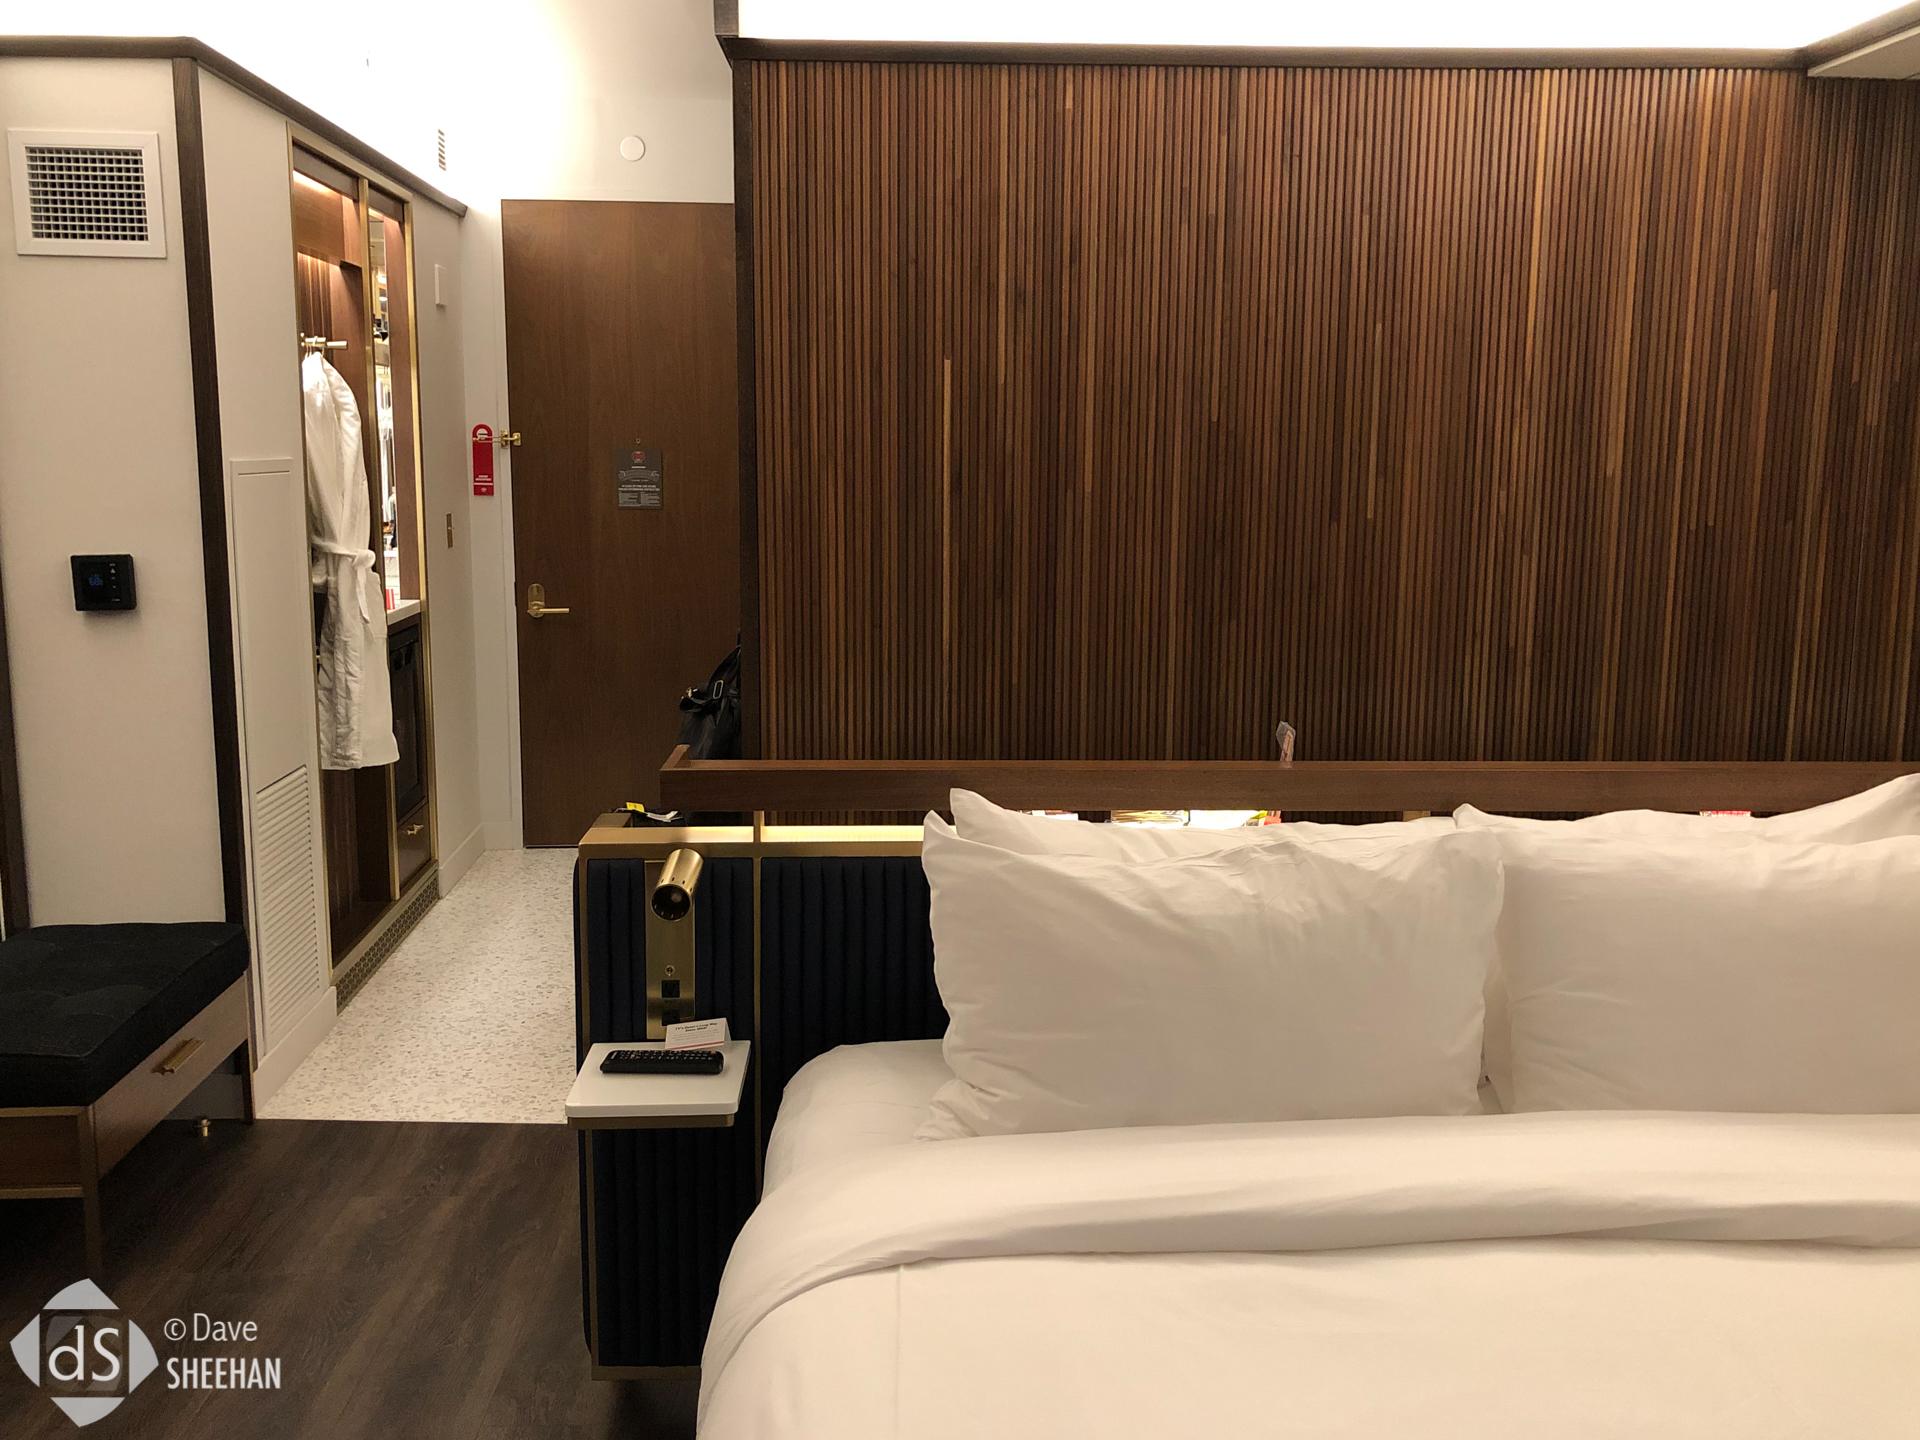 twa-hotel-jfk-13.jpg